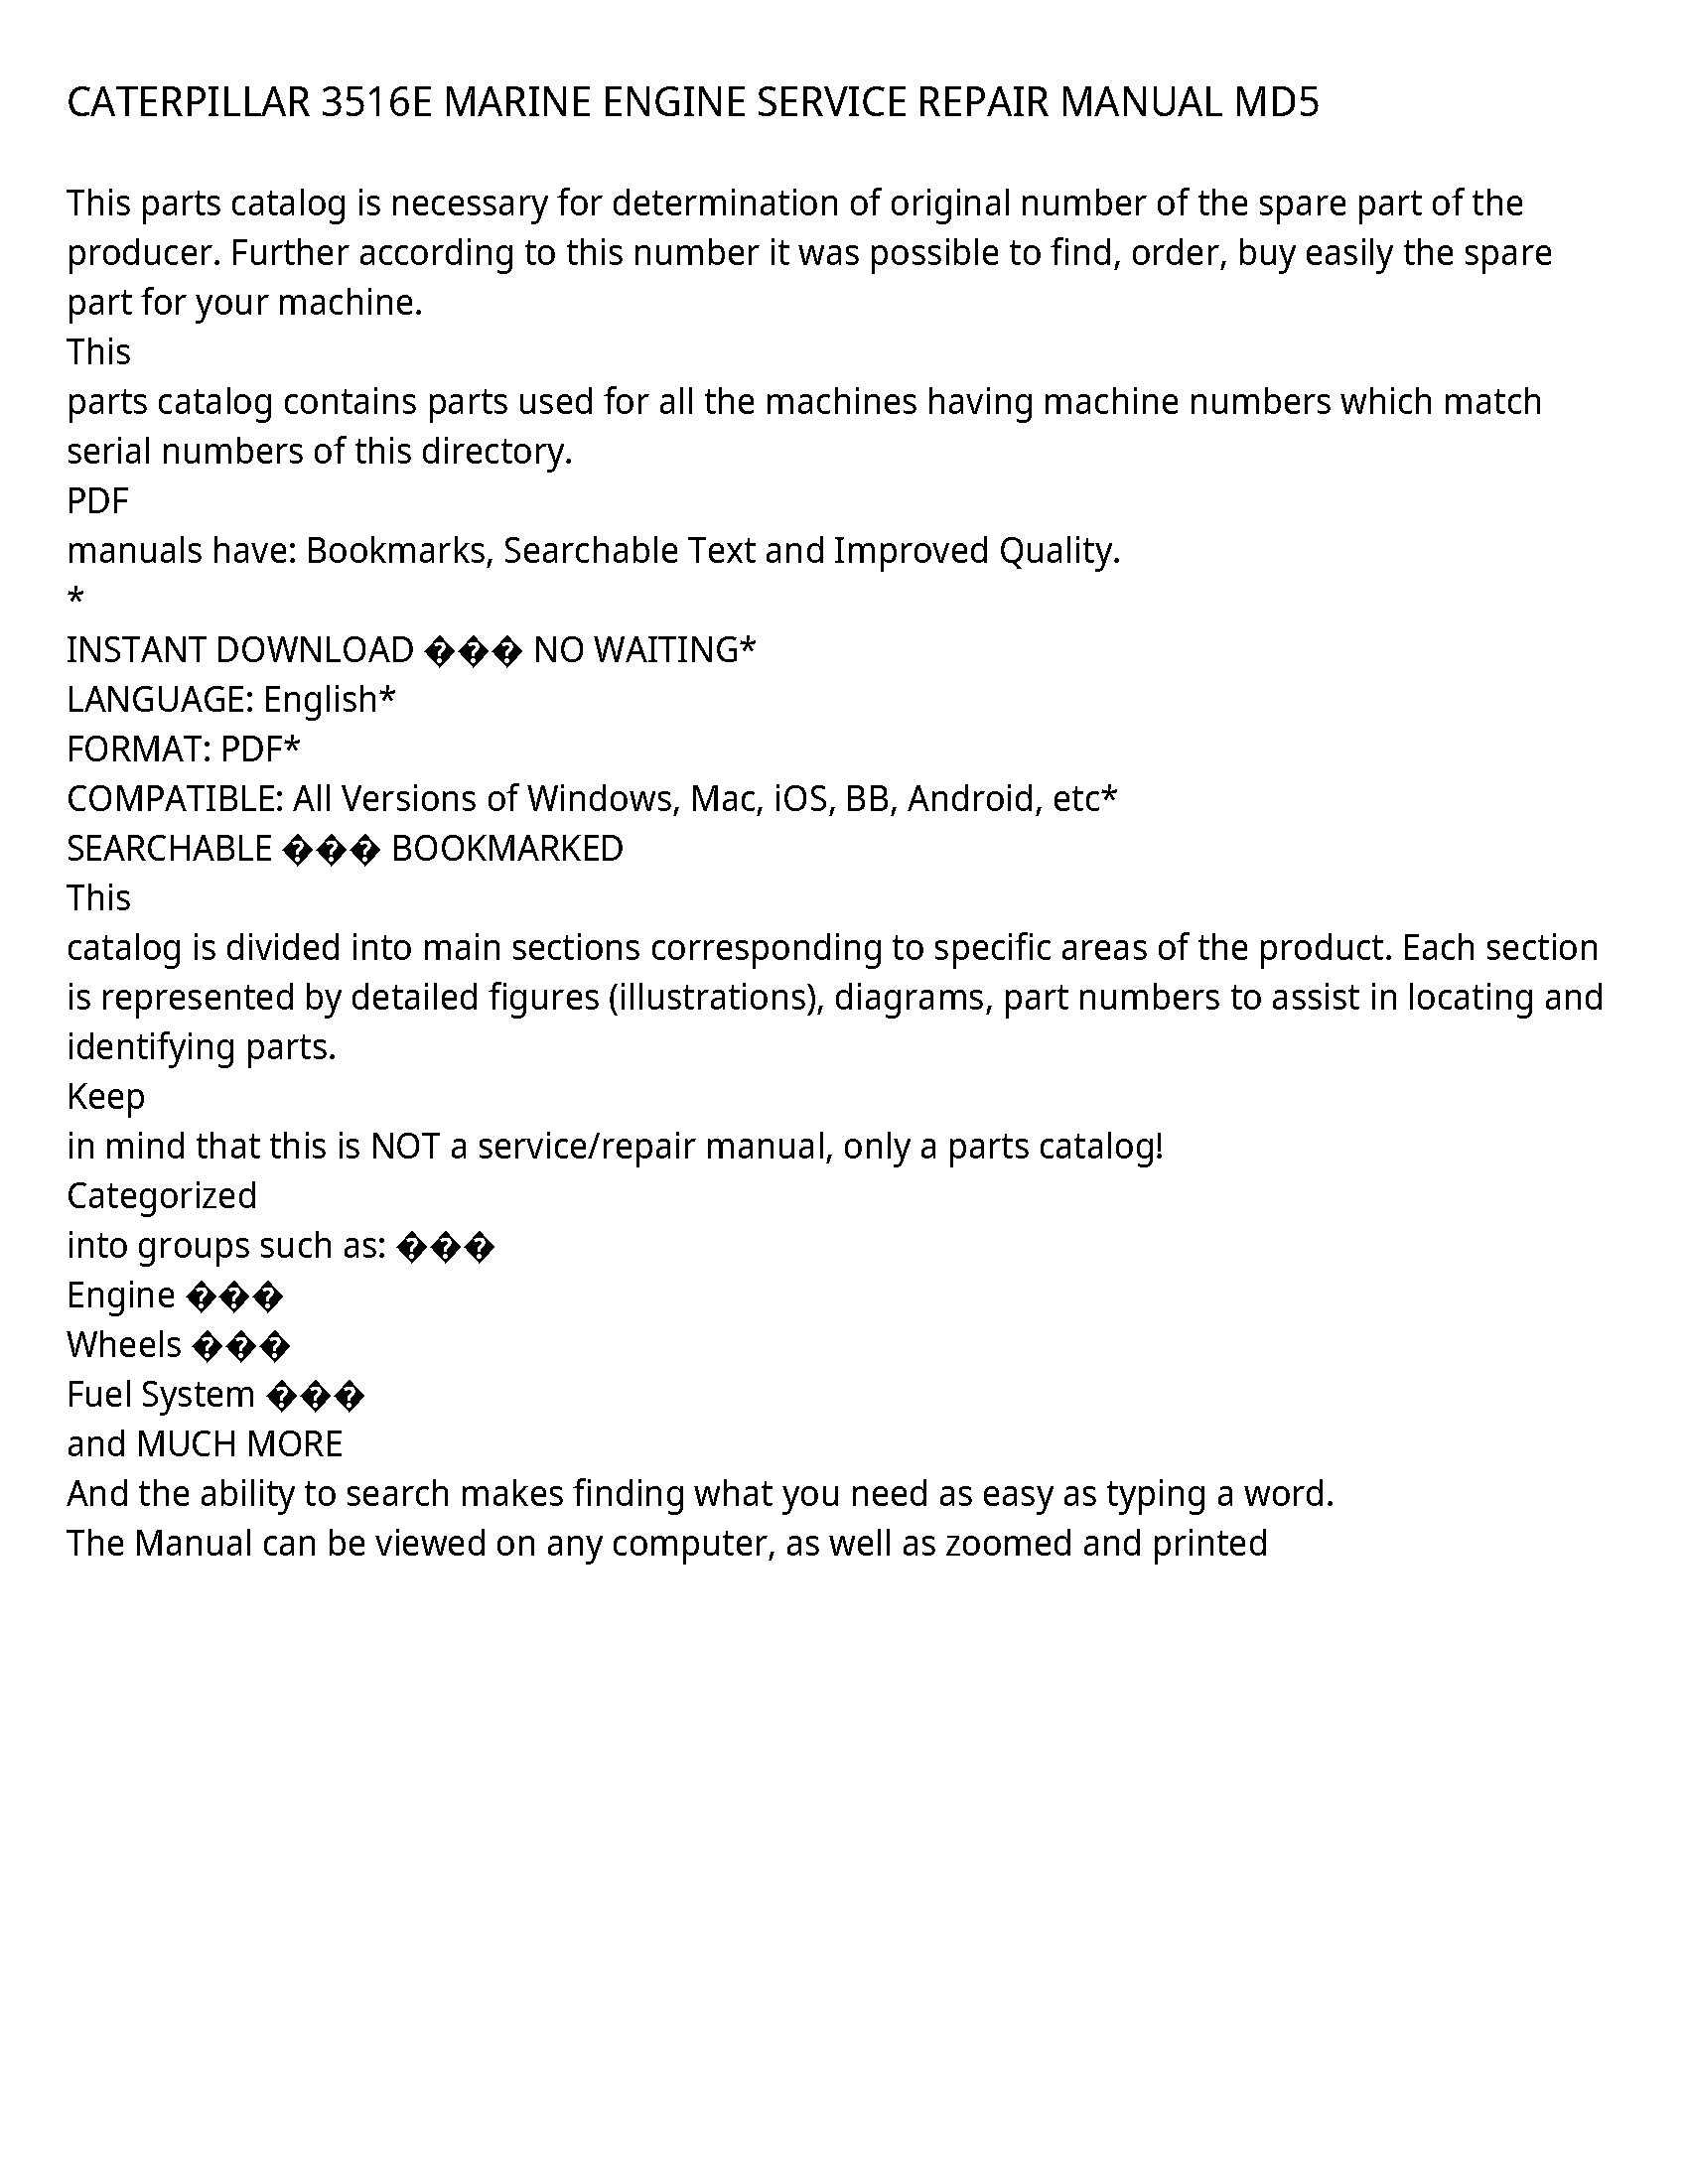 Caterpillar 3516E service manual